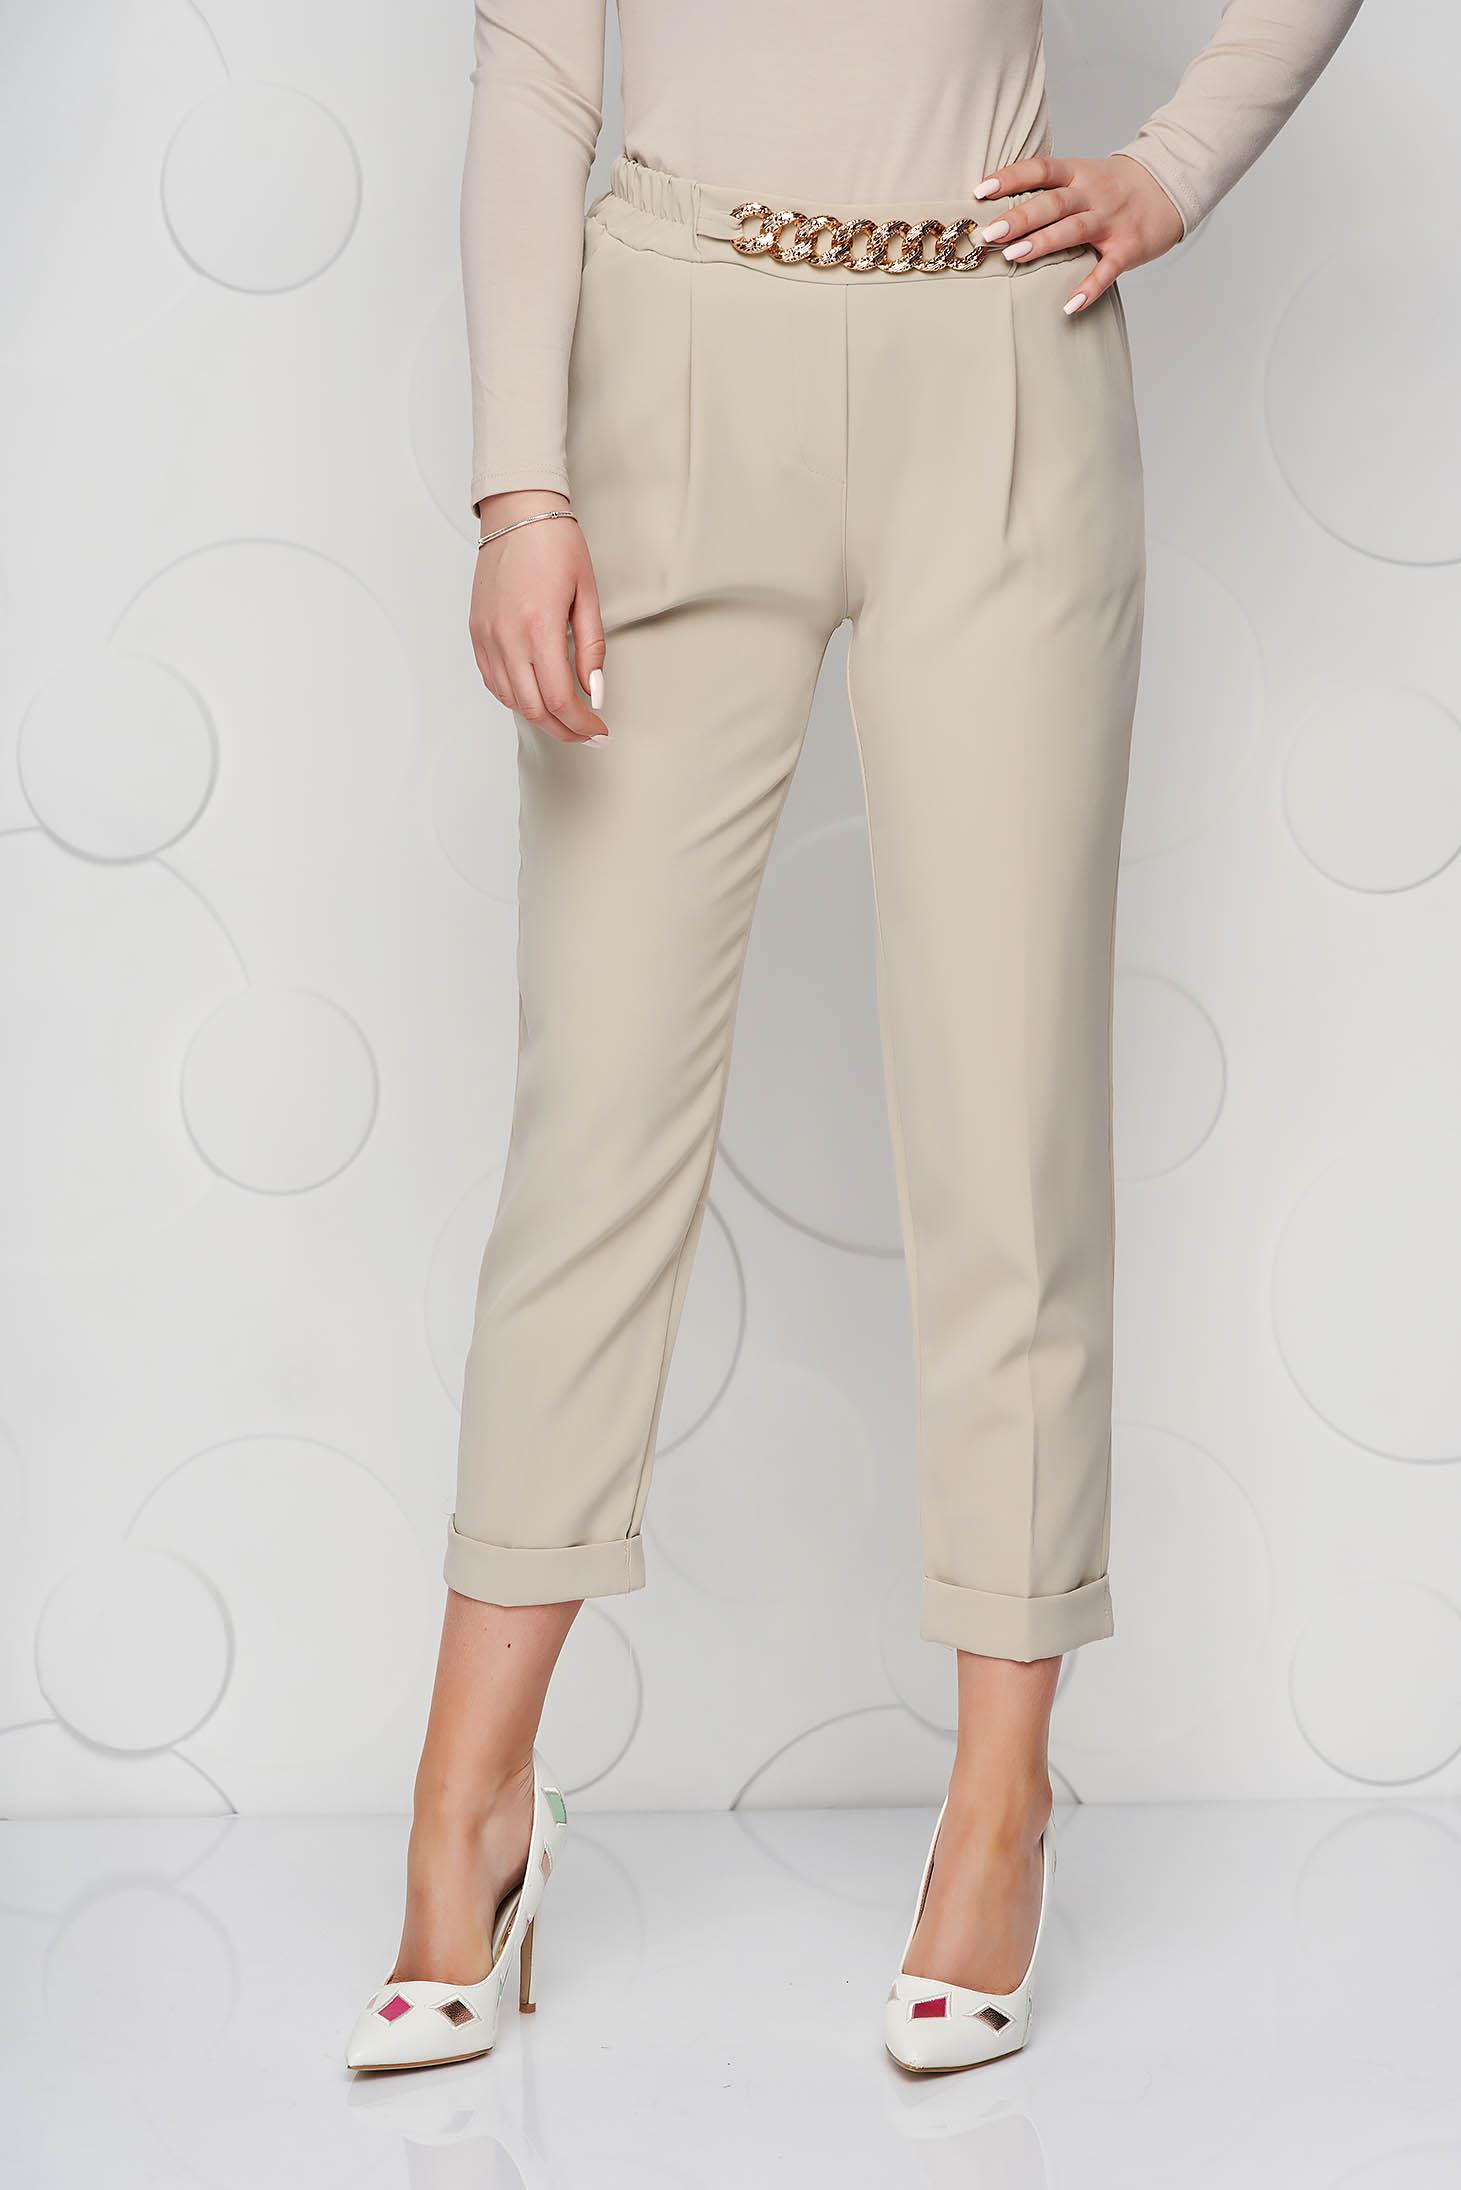 Cream trousers metallic chain accessory loose fit nonelastic fabric